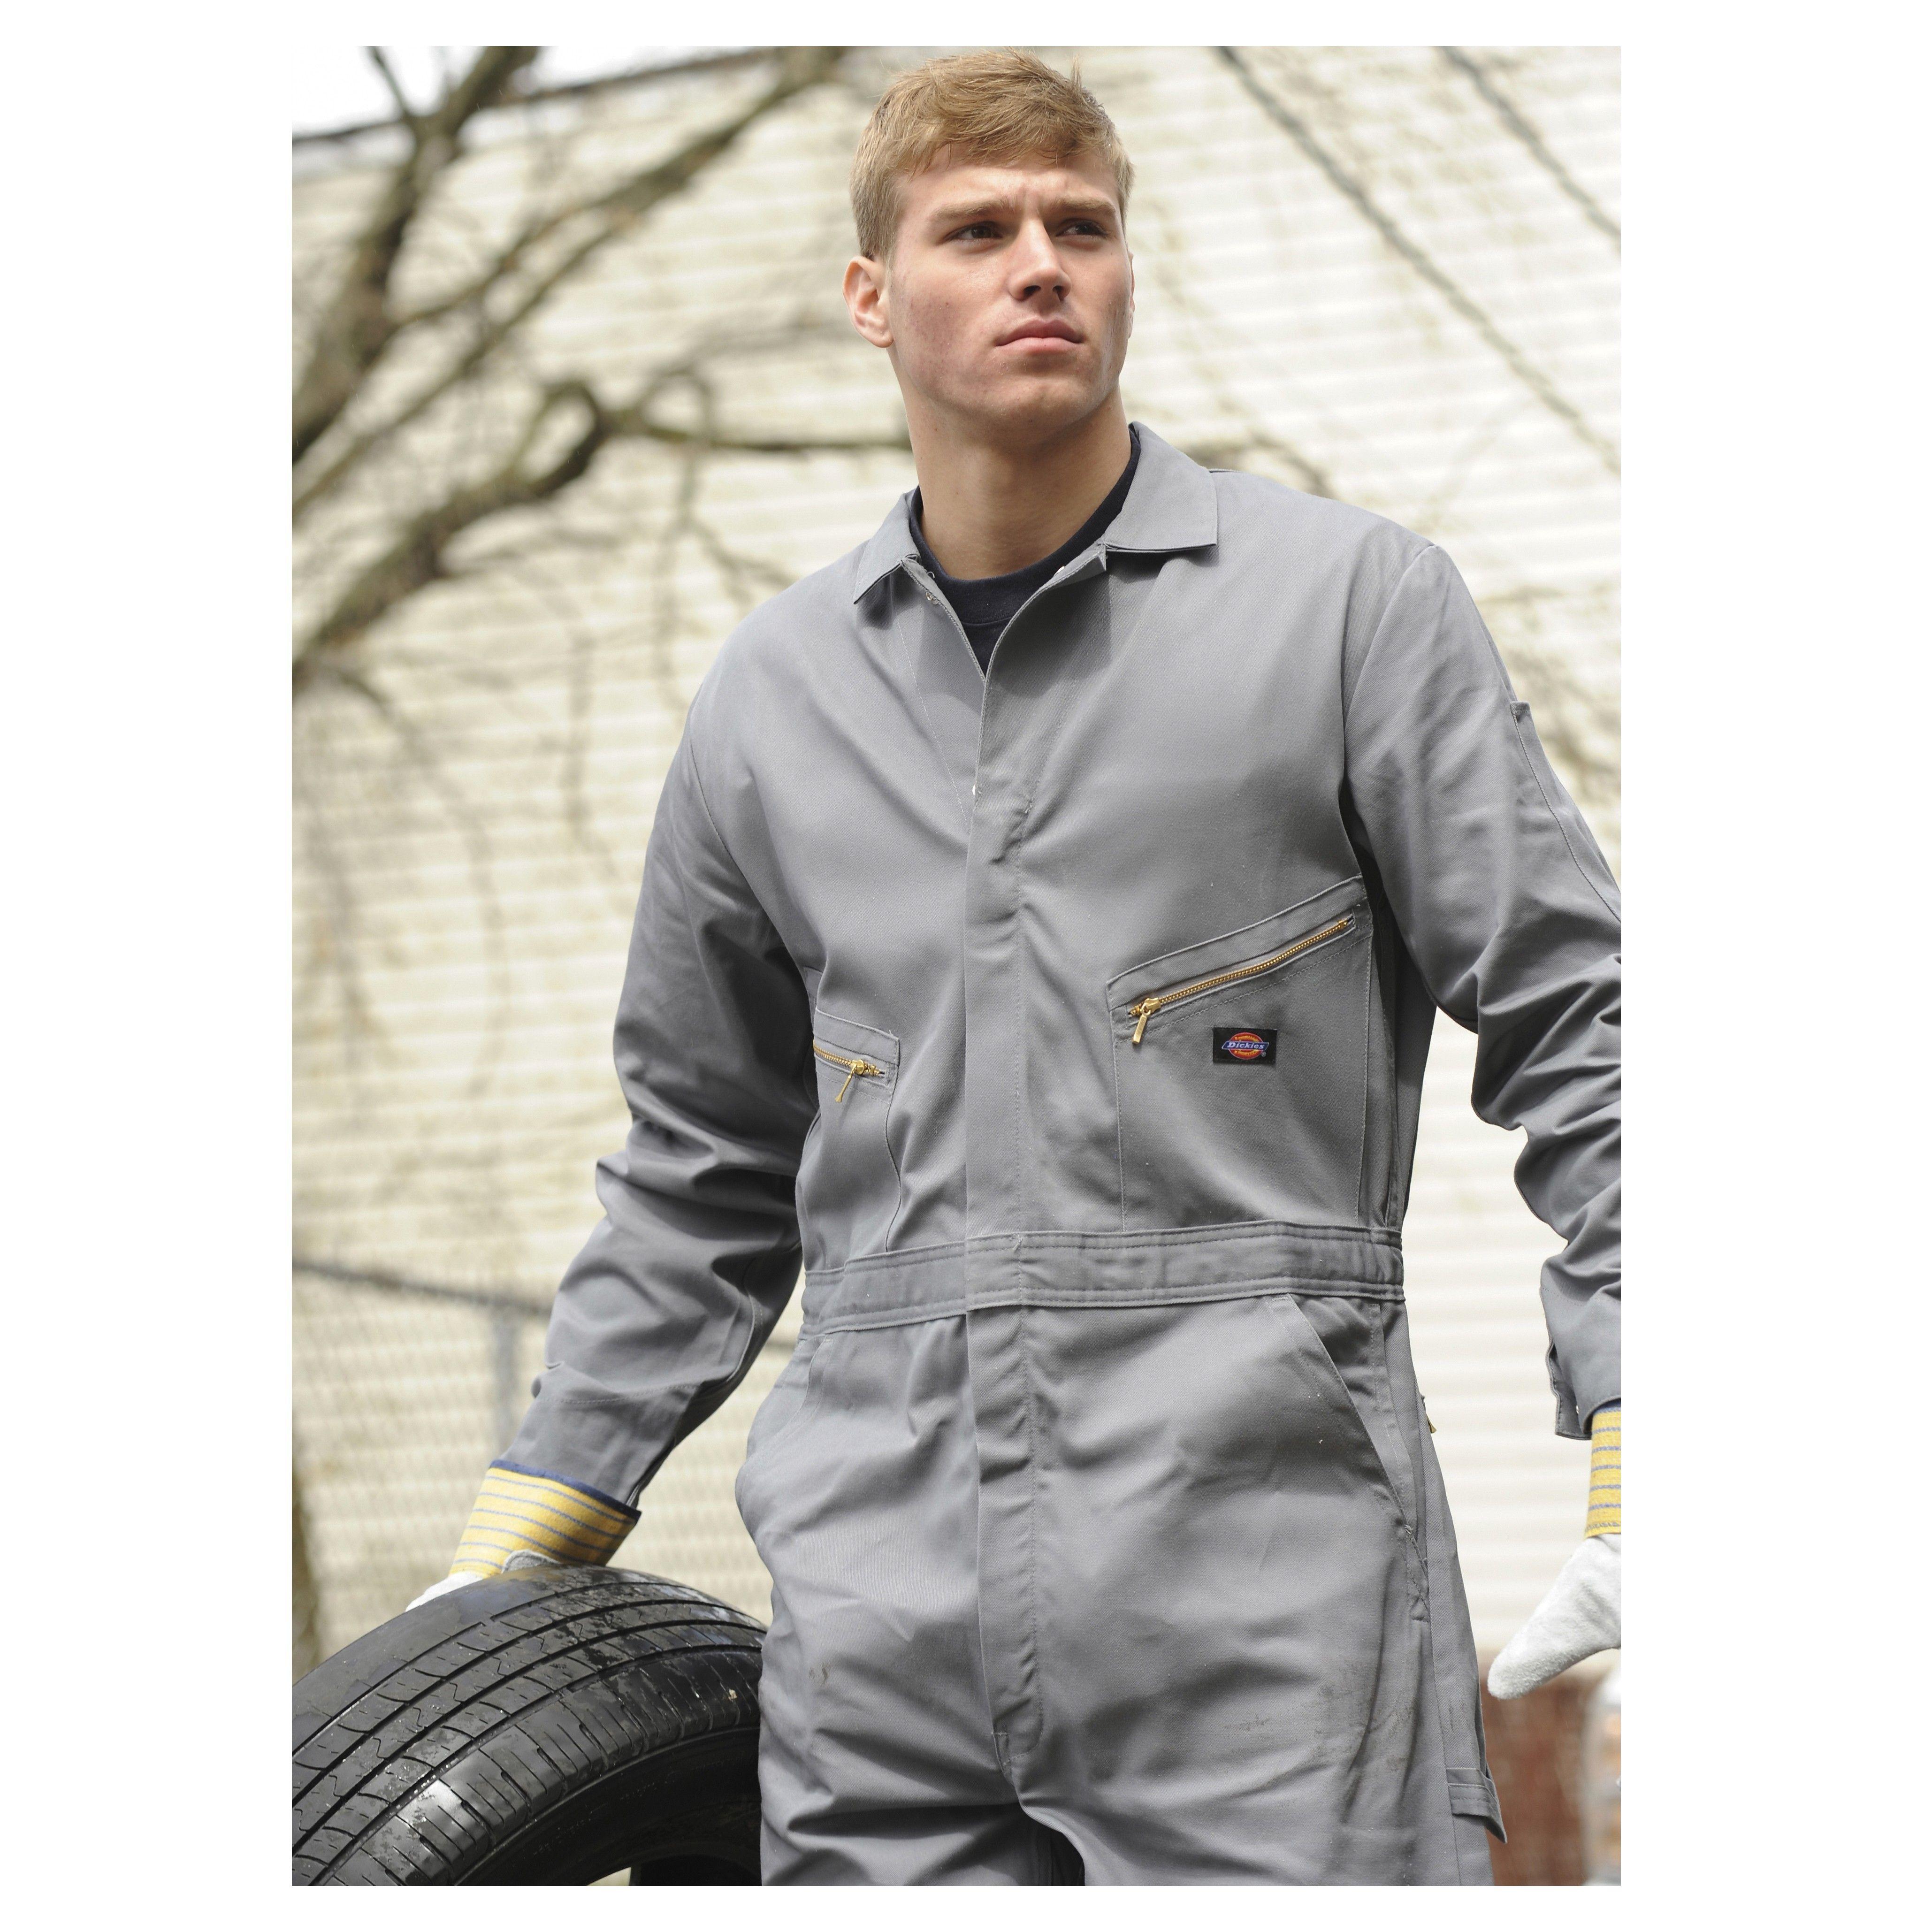 c138dda5b1f Dickies Men s Deluxe Cotton Coveralls - 48700